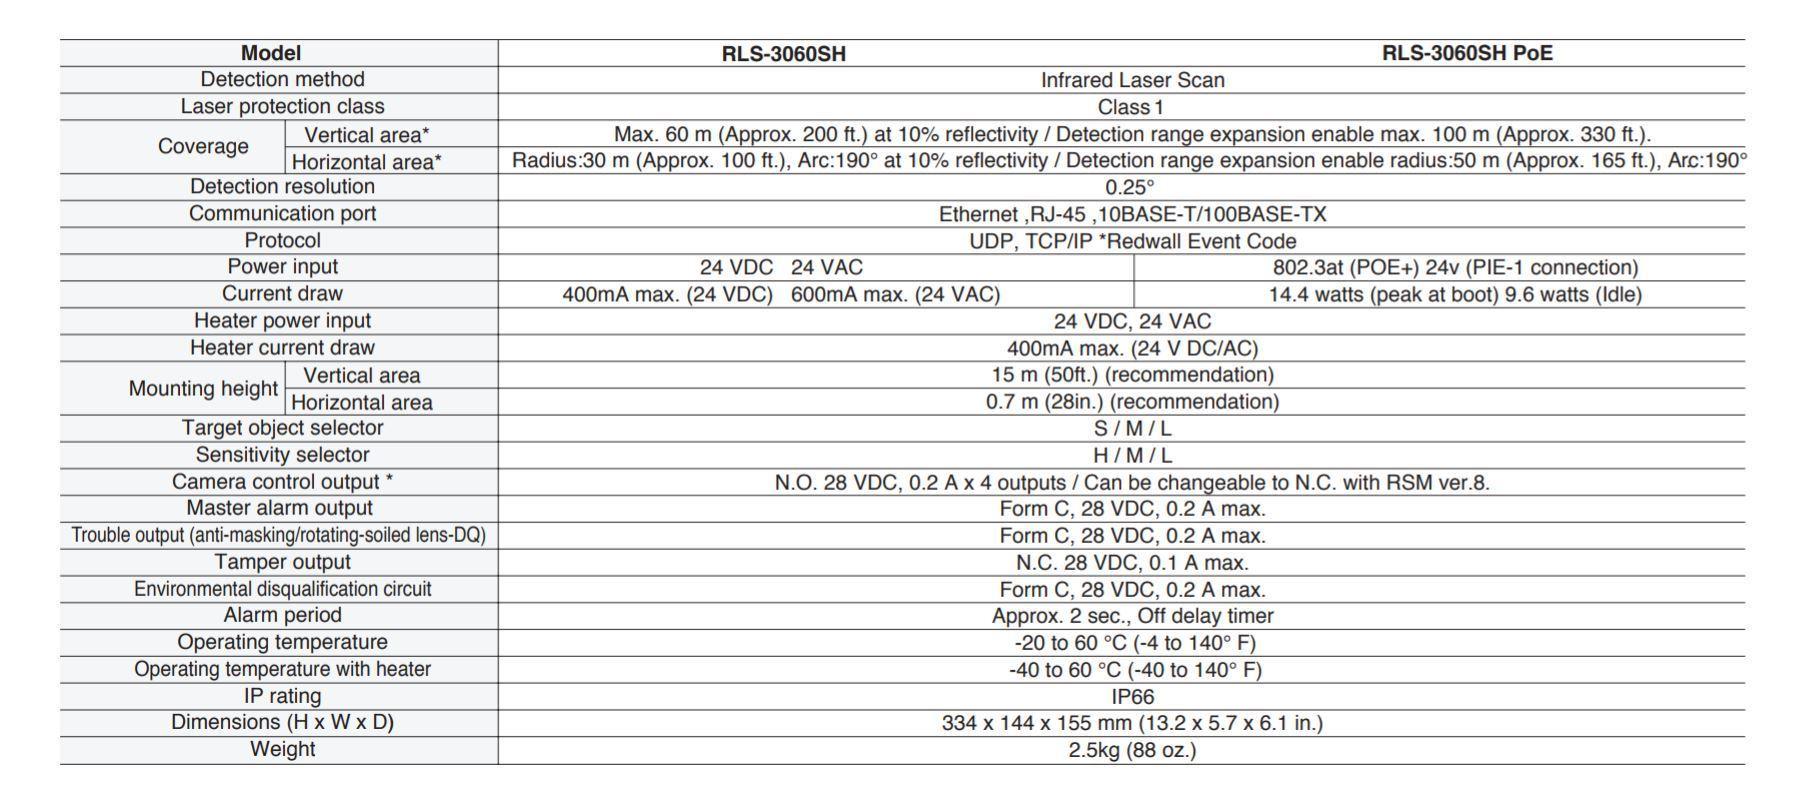 Optex rls 3060sh specifications en